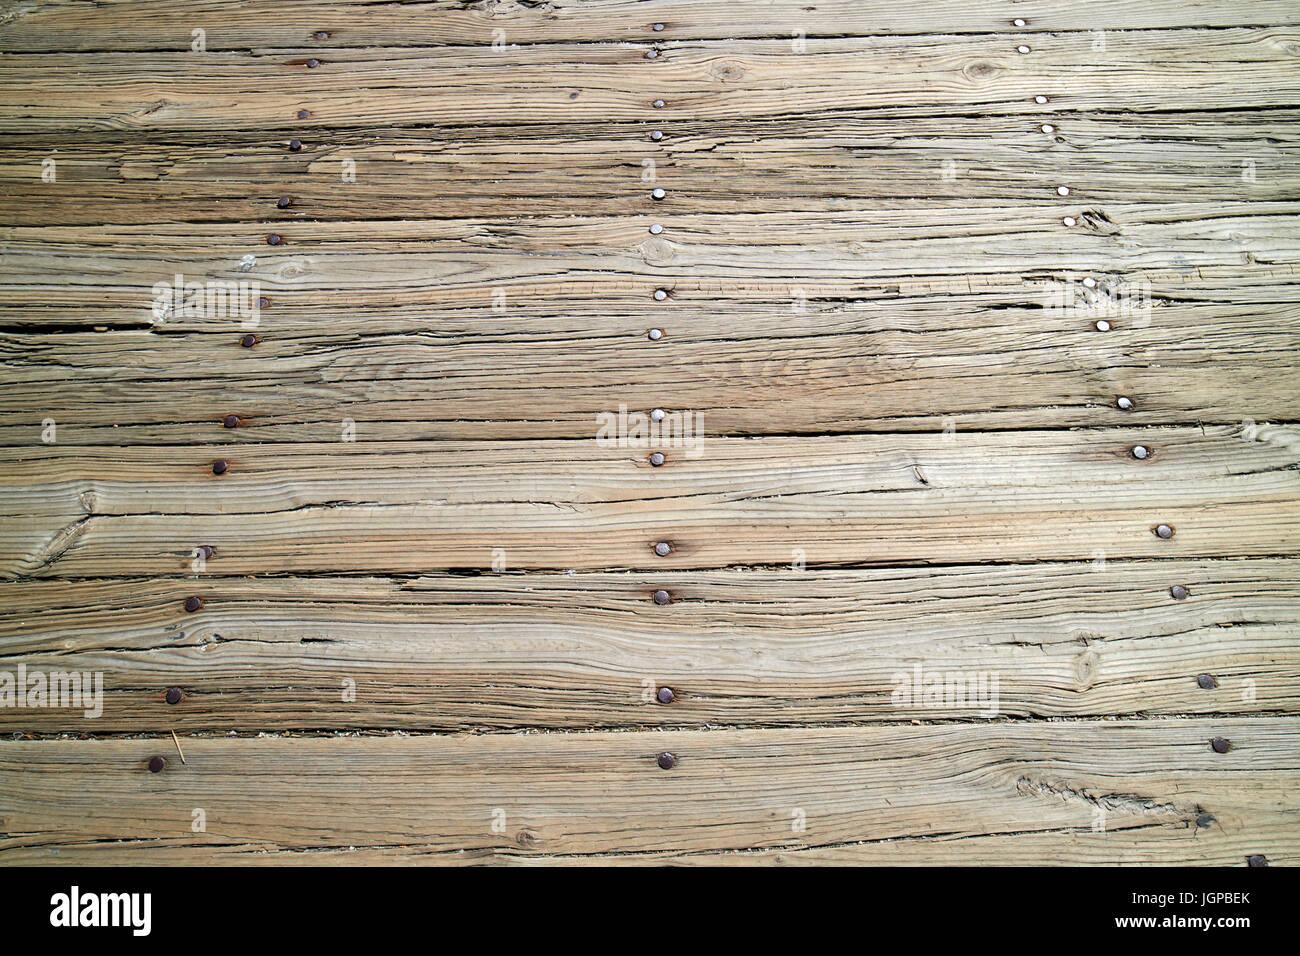 worn wooden planks on boardway harborwalk Boston USA - Stock Image